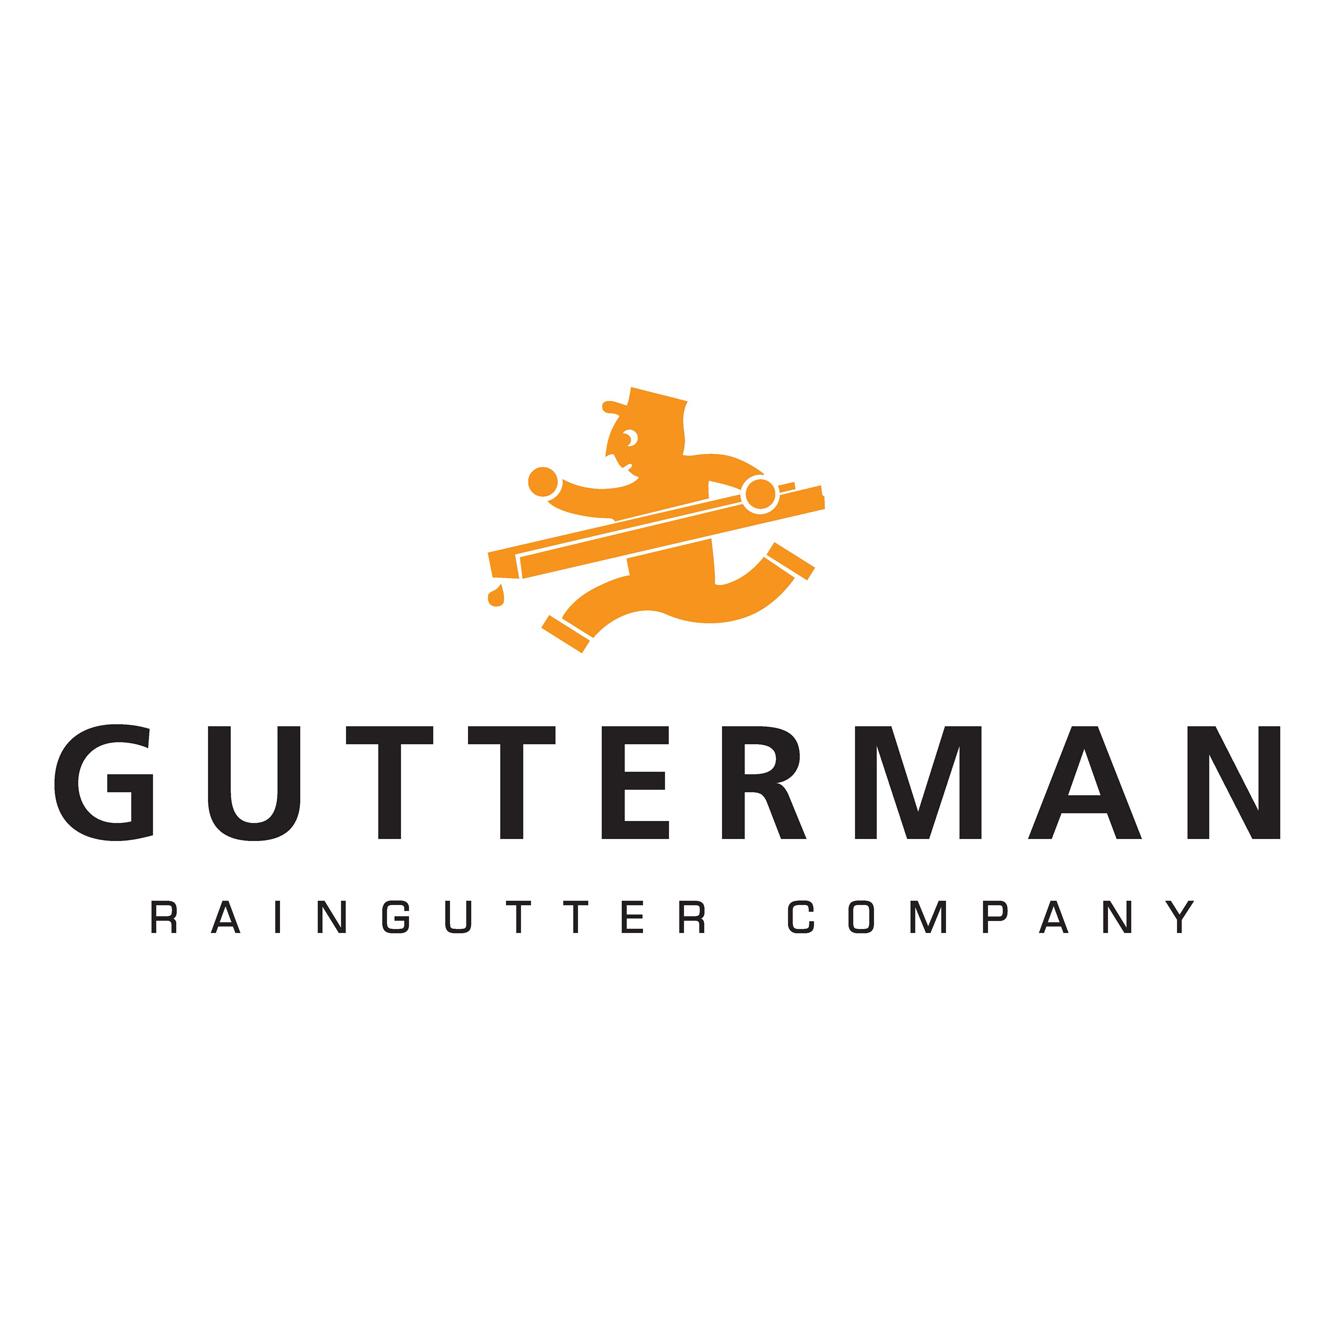 Gutterman Raingutter Company image 14